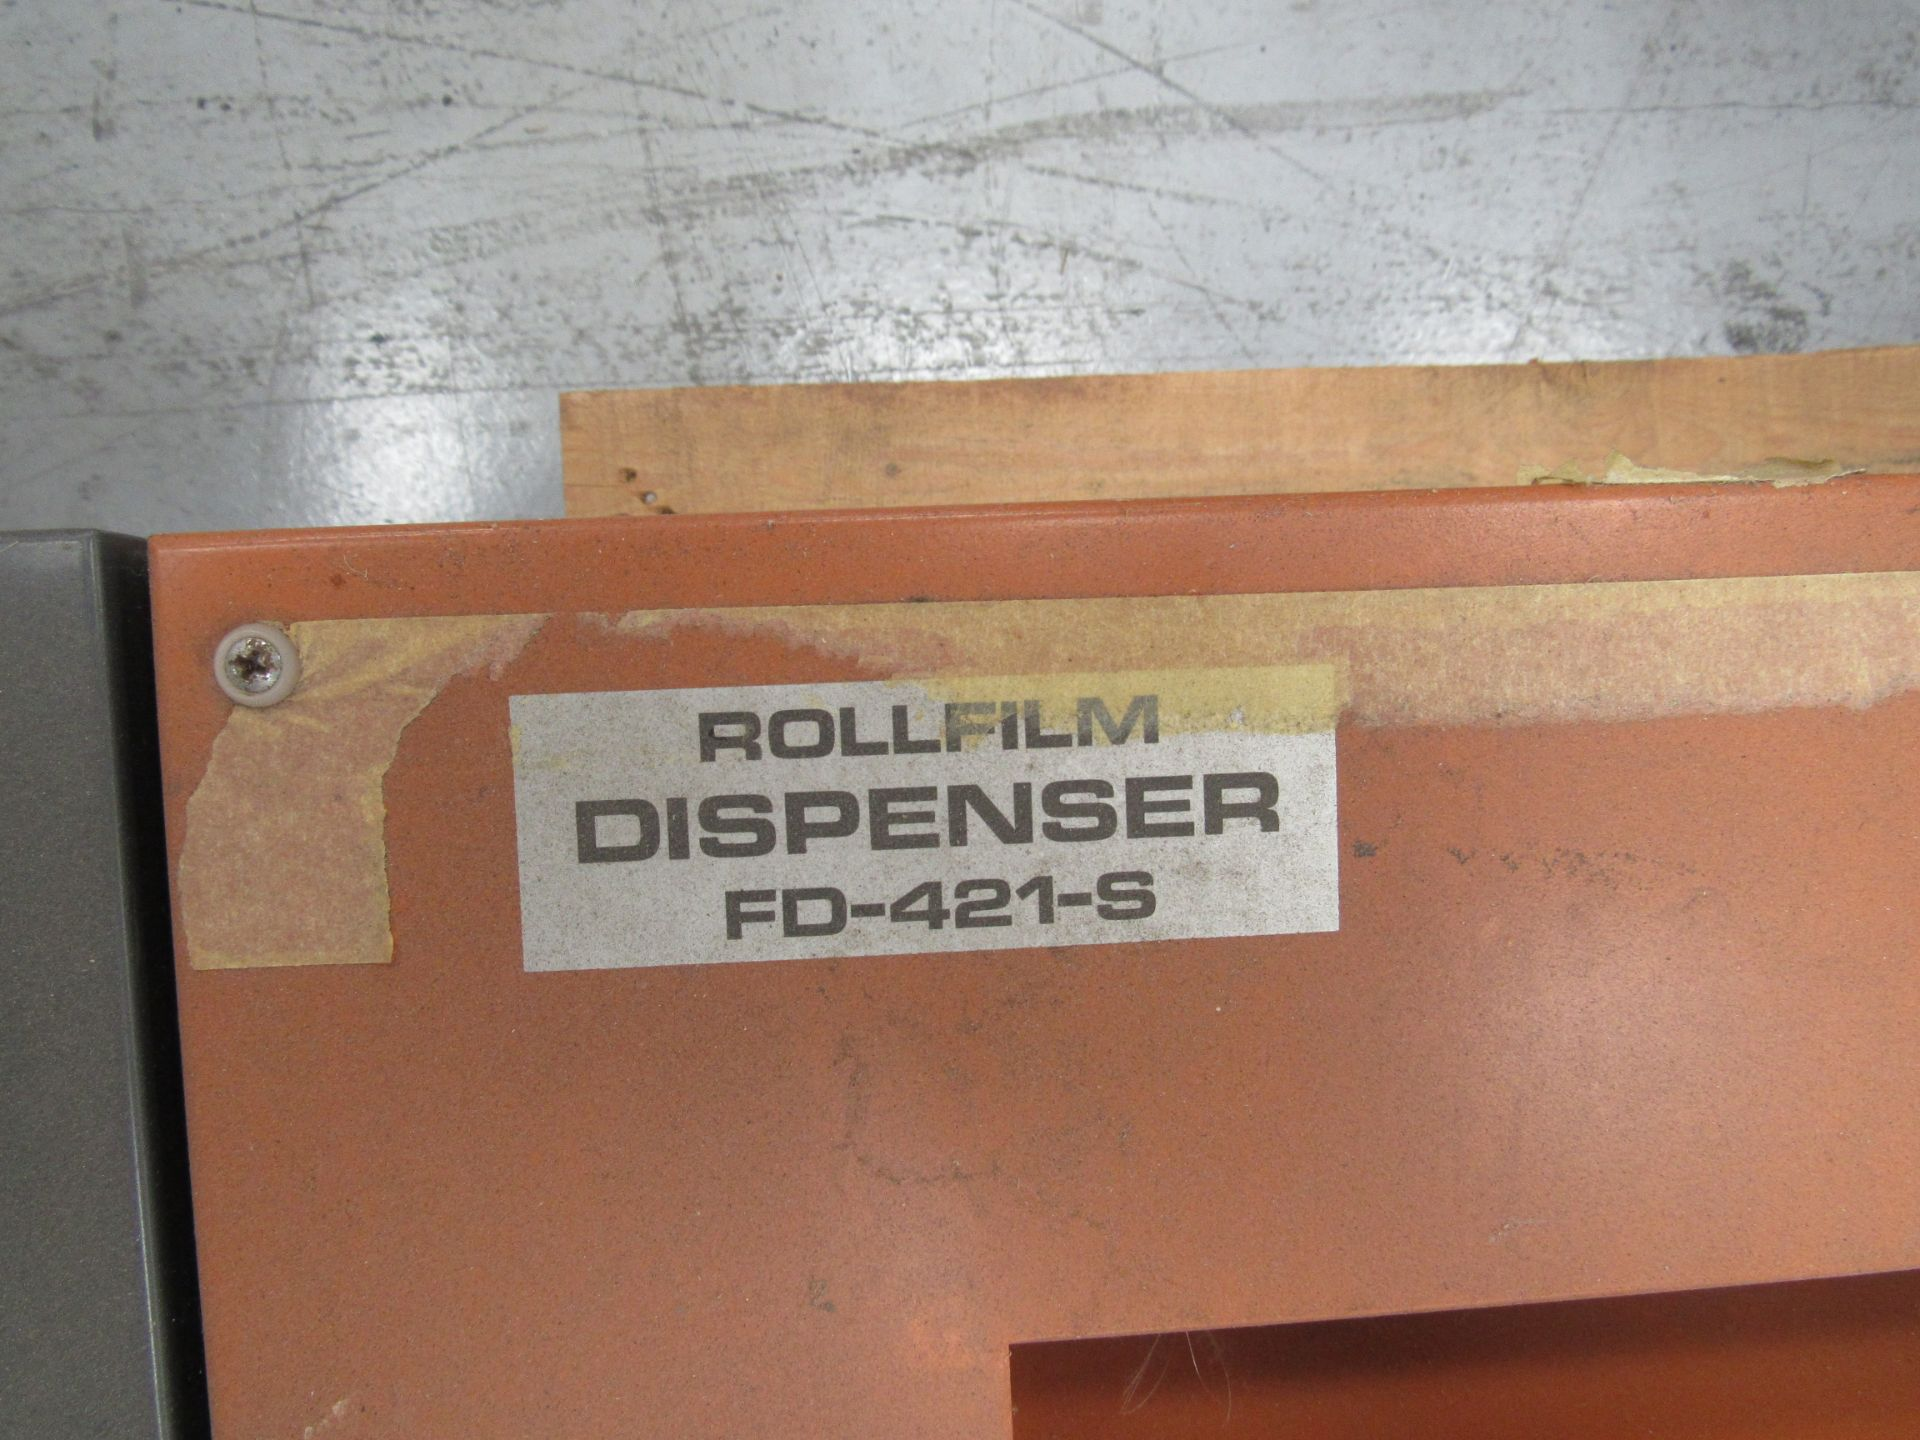 Shashin Kagaku Roll Film Dispenser FD-421-S - Image 4 of 4